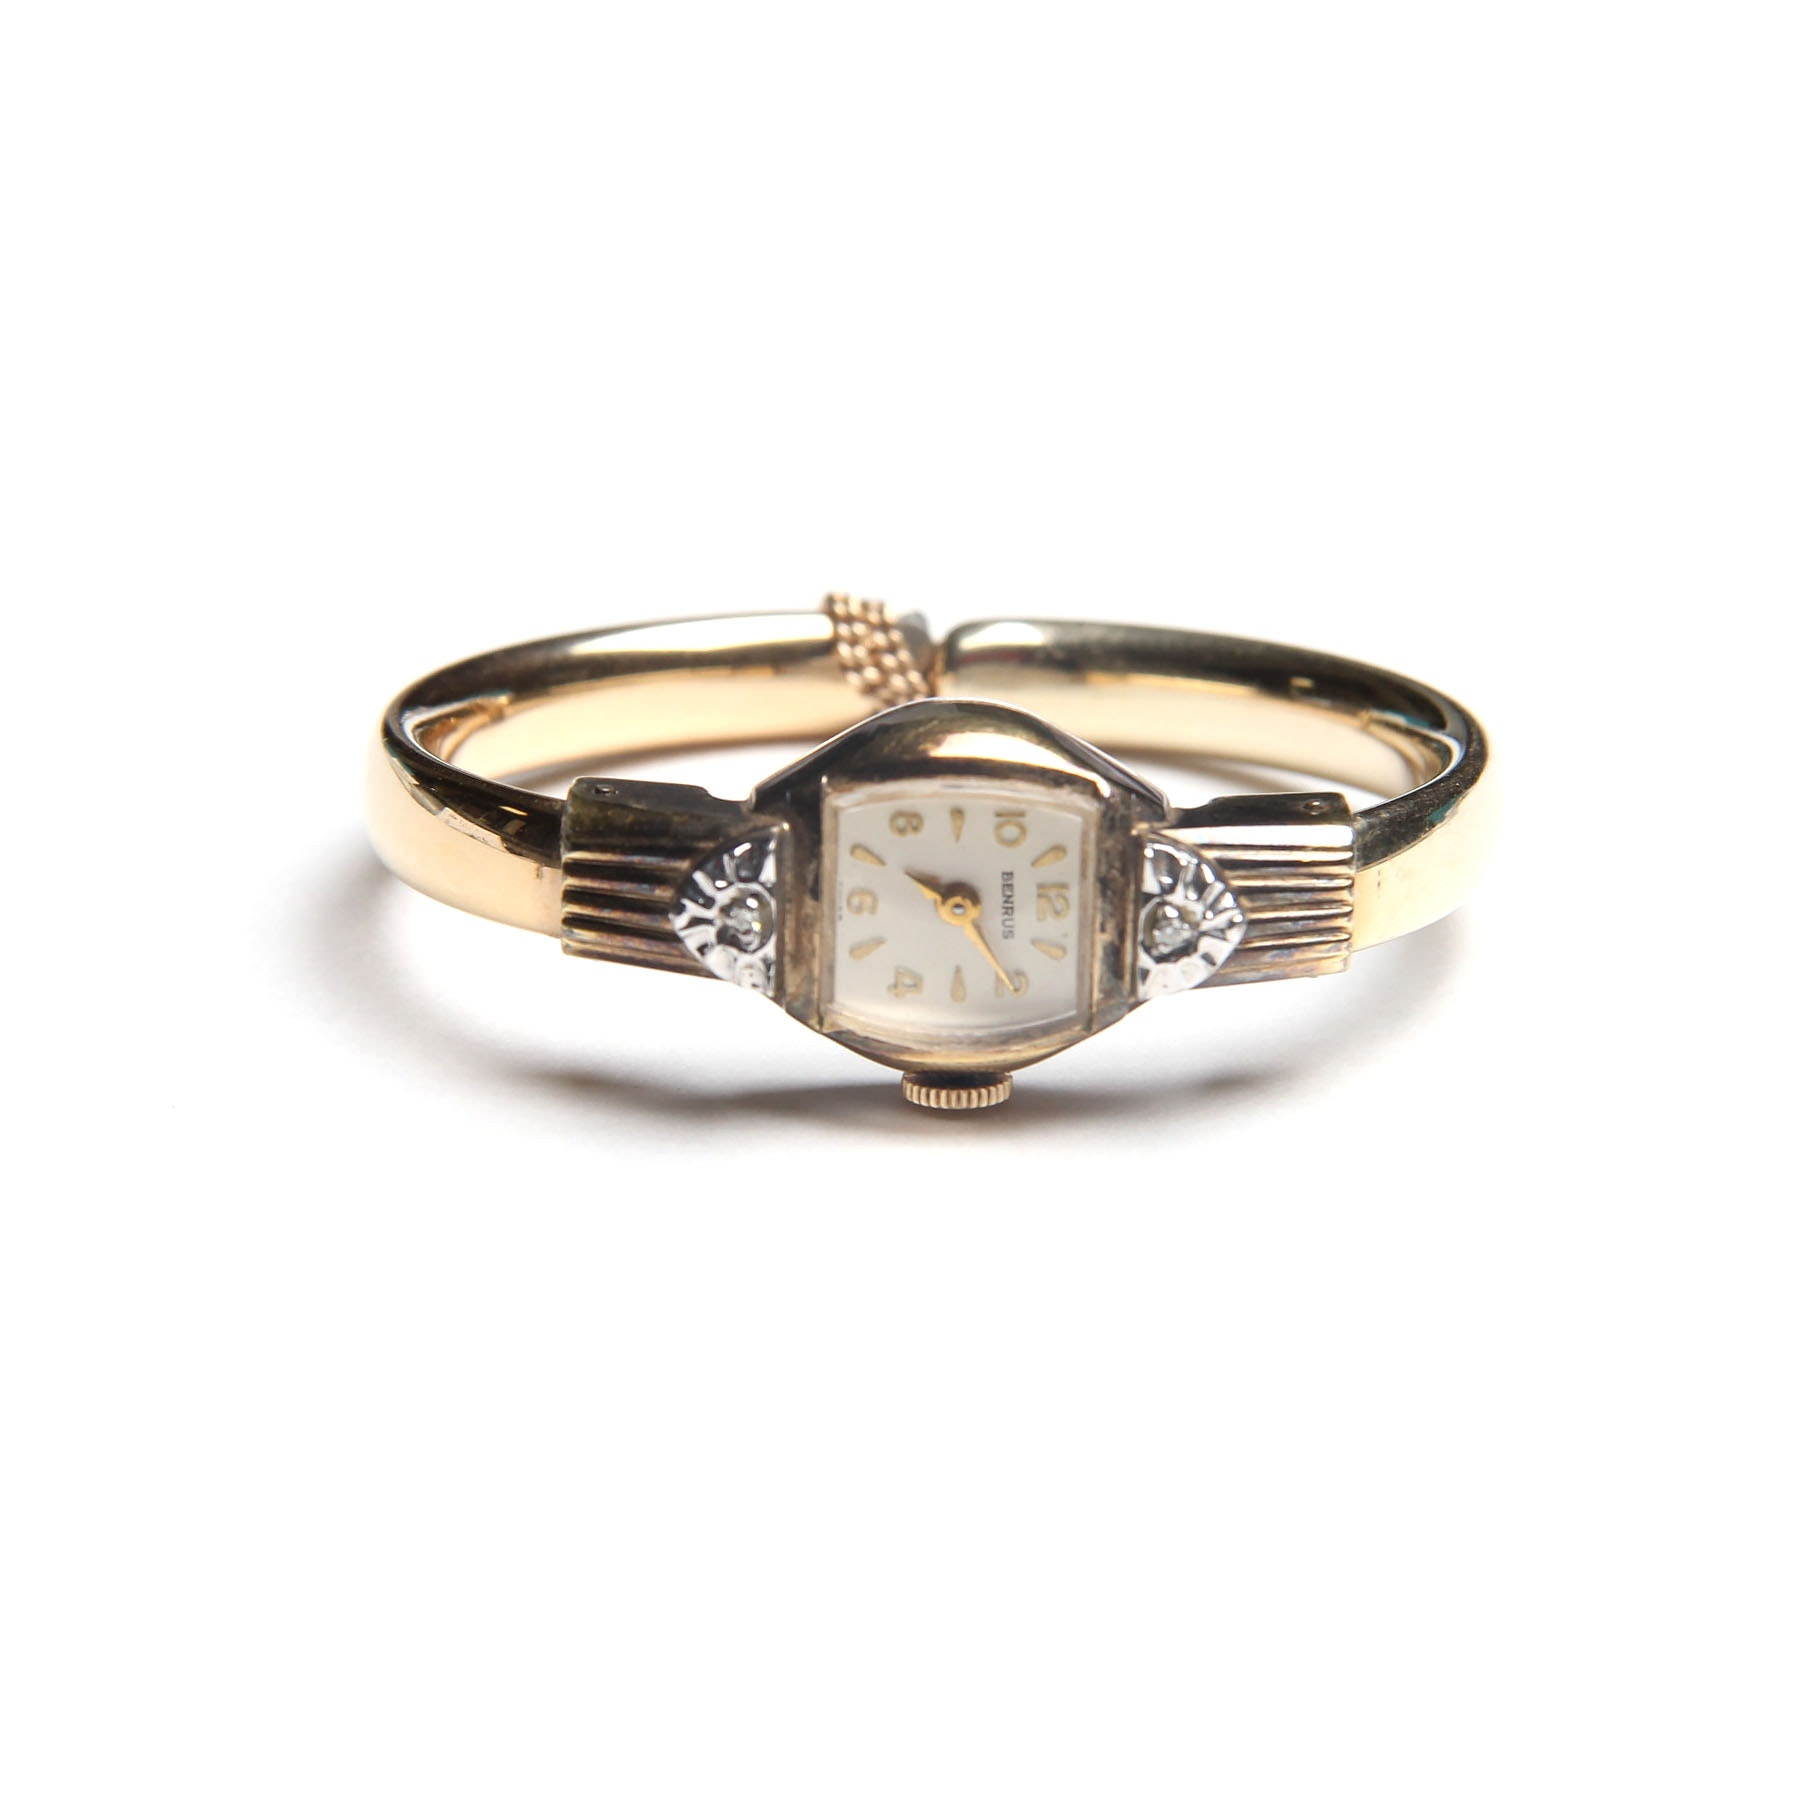 10K Yellow Gold Filled and Diamond Benrus Wristwatch